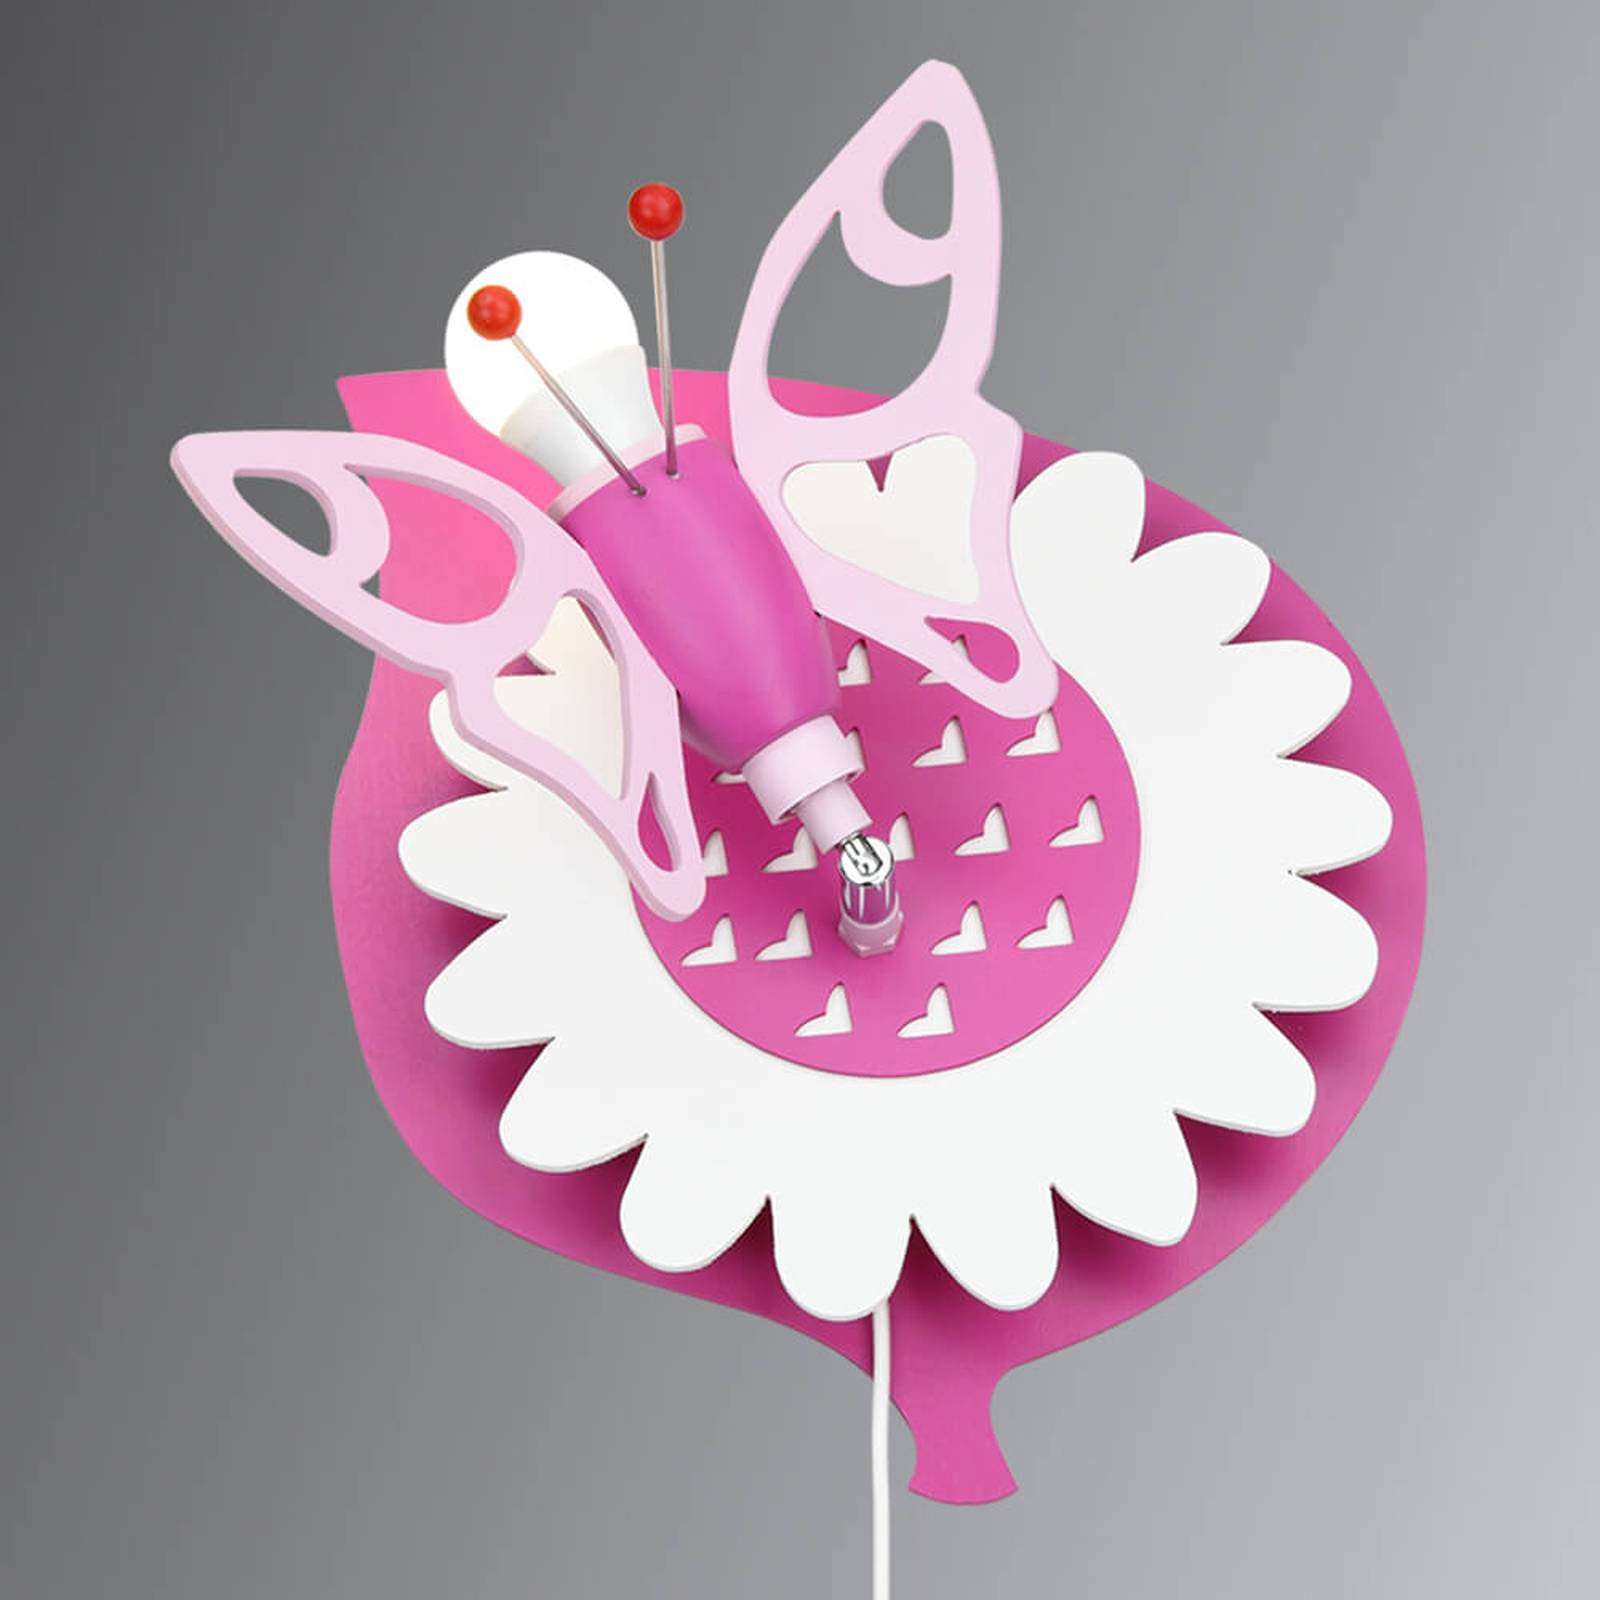 Wandlamp Vlinder voor kinderkamer, 1-lamp